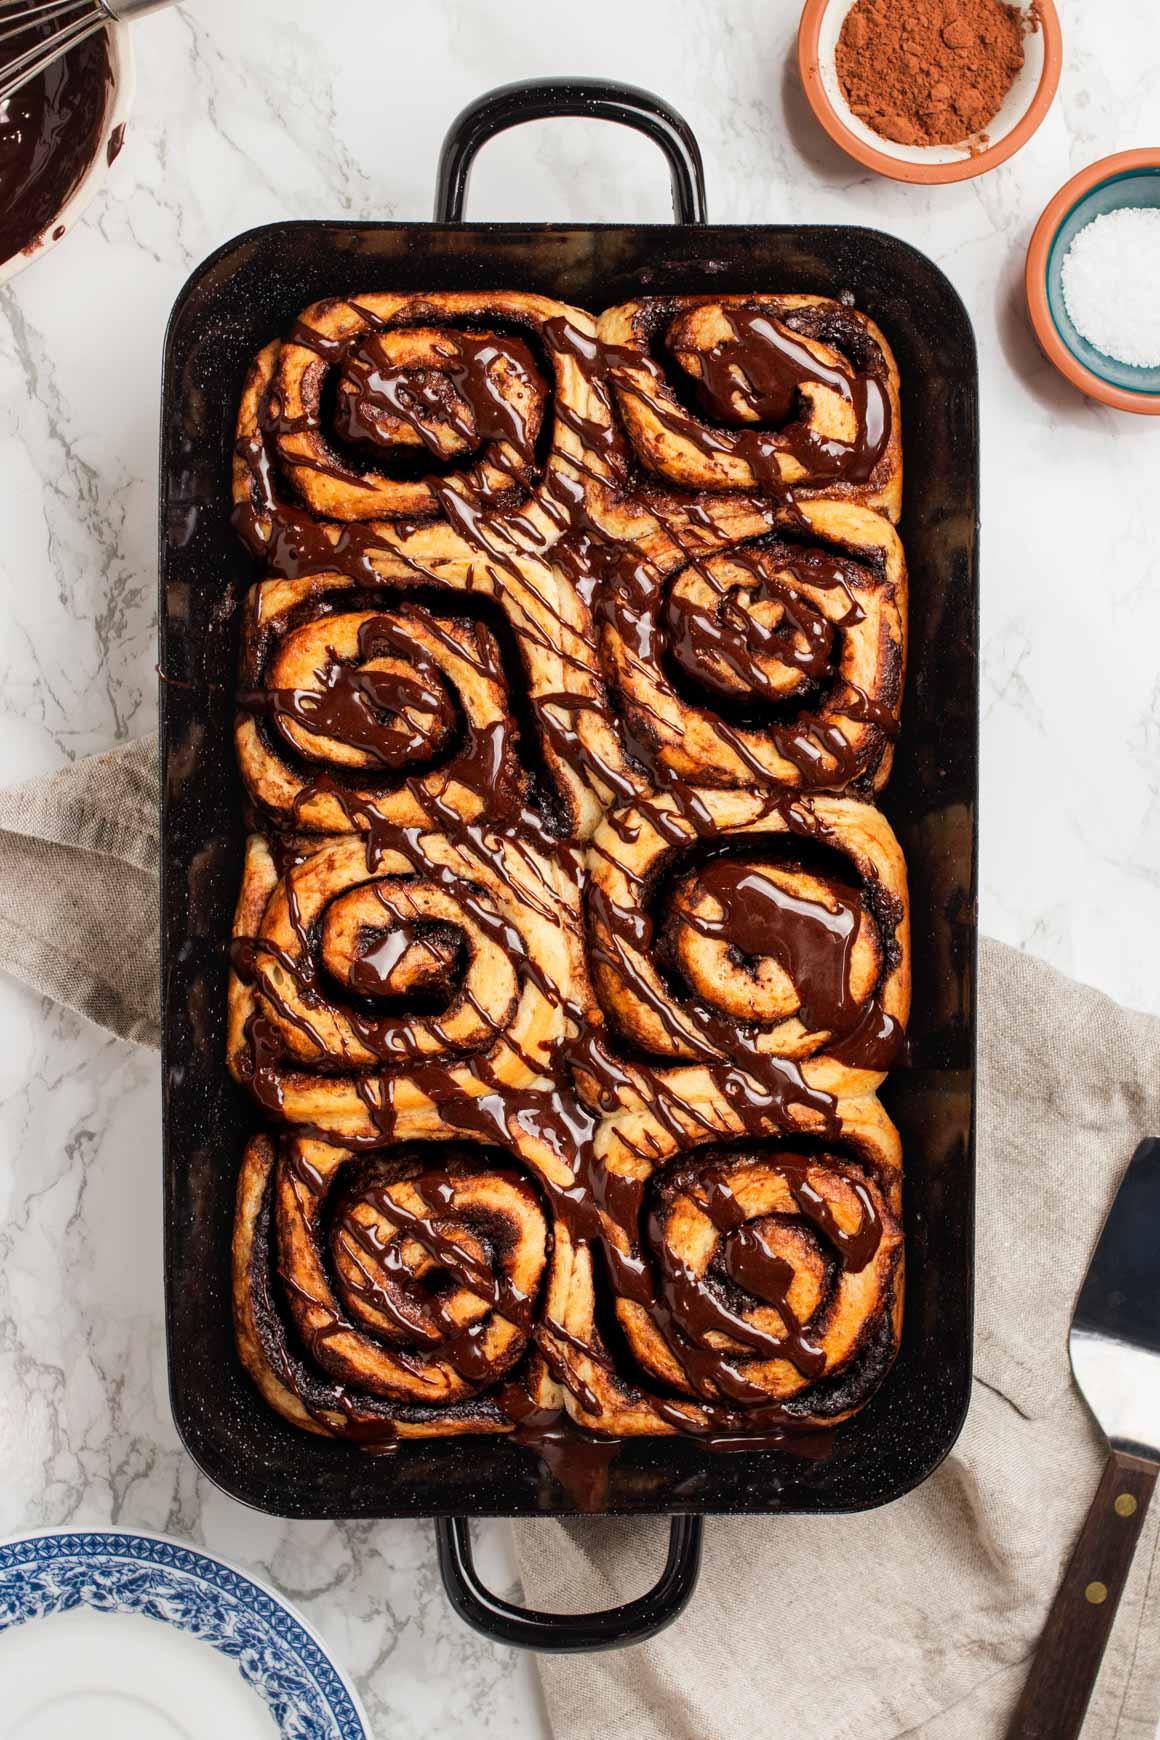 vegan chocolate cinnamon buns with chocolate glaze